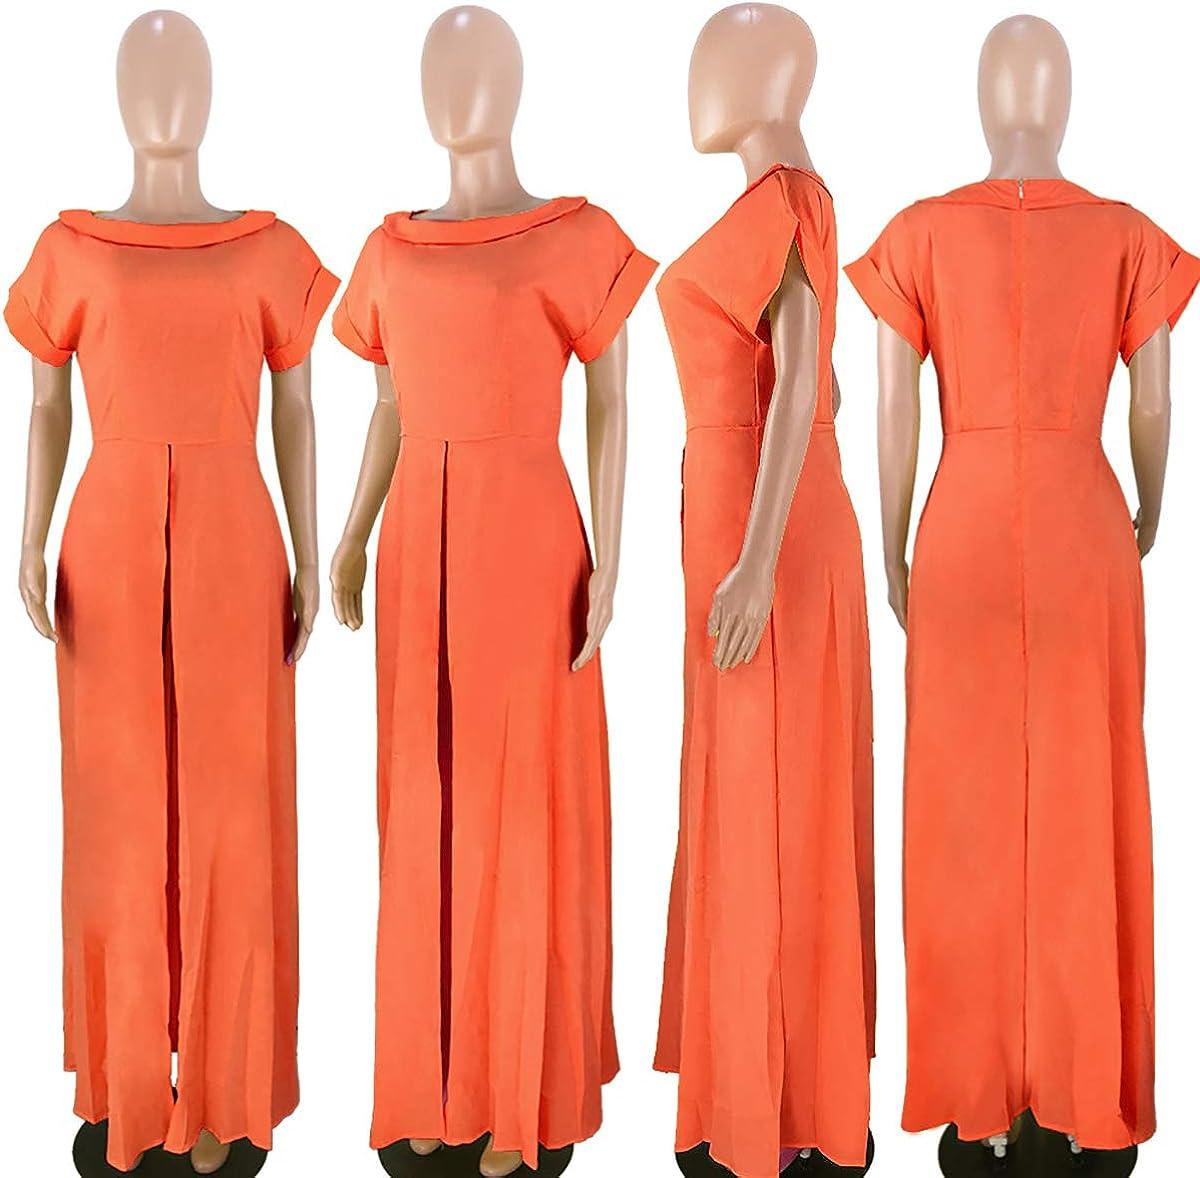 Womens High Low Blouses Short Sleeve Drawstring Asymetrical Summer High Low Shirt Top Orange1